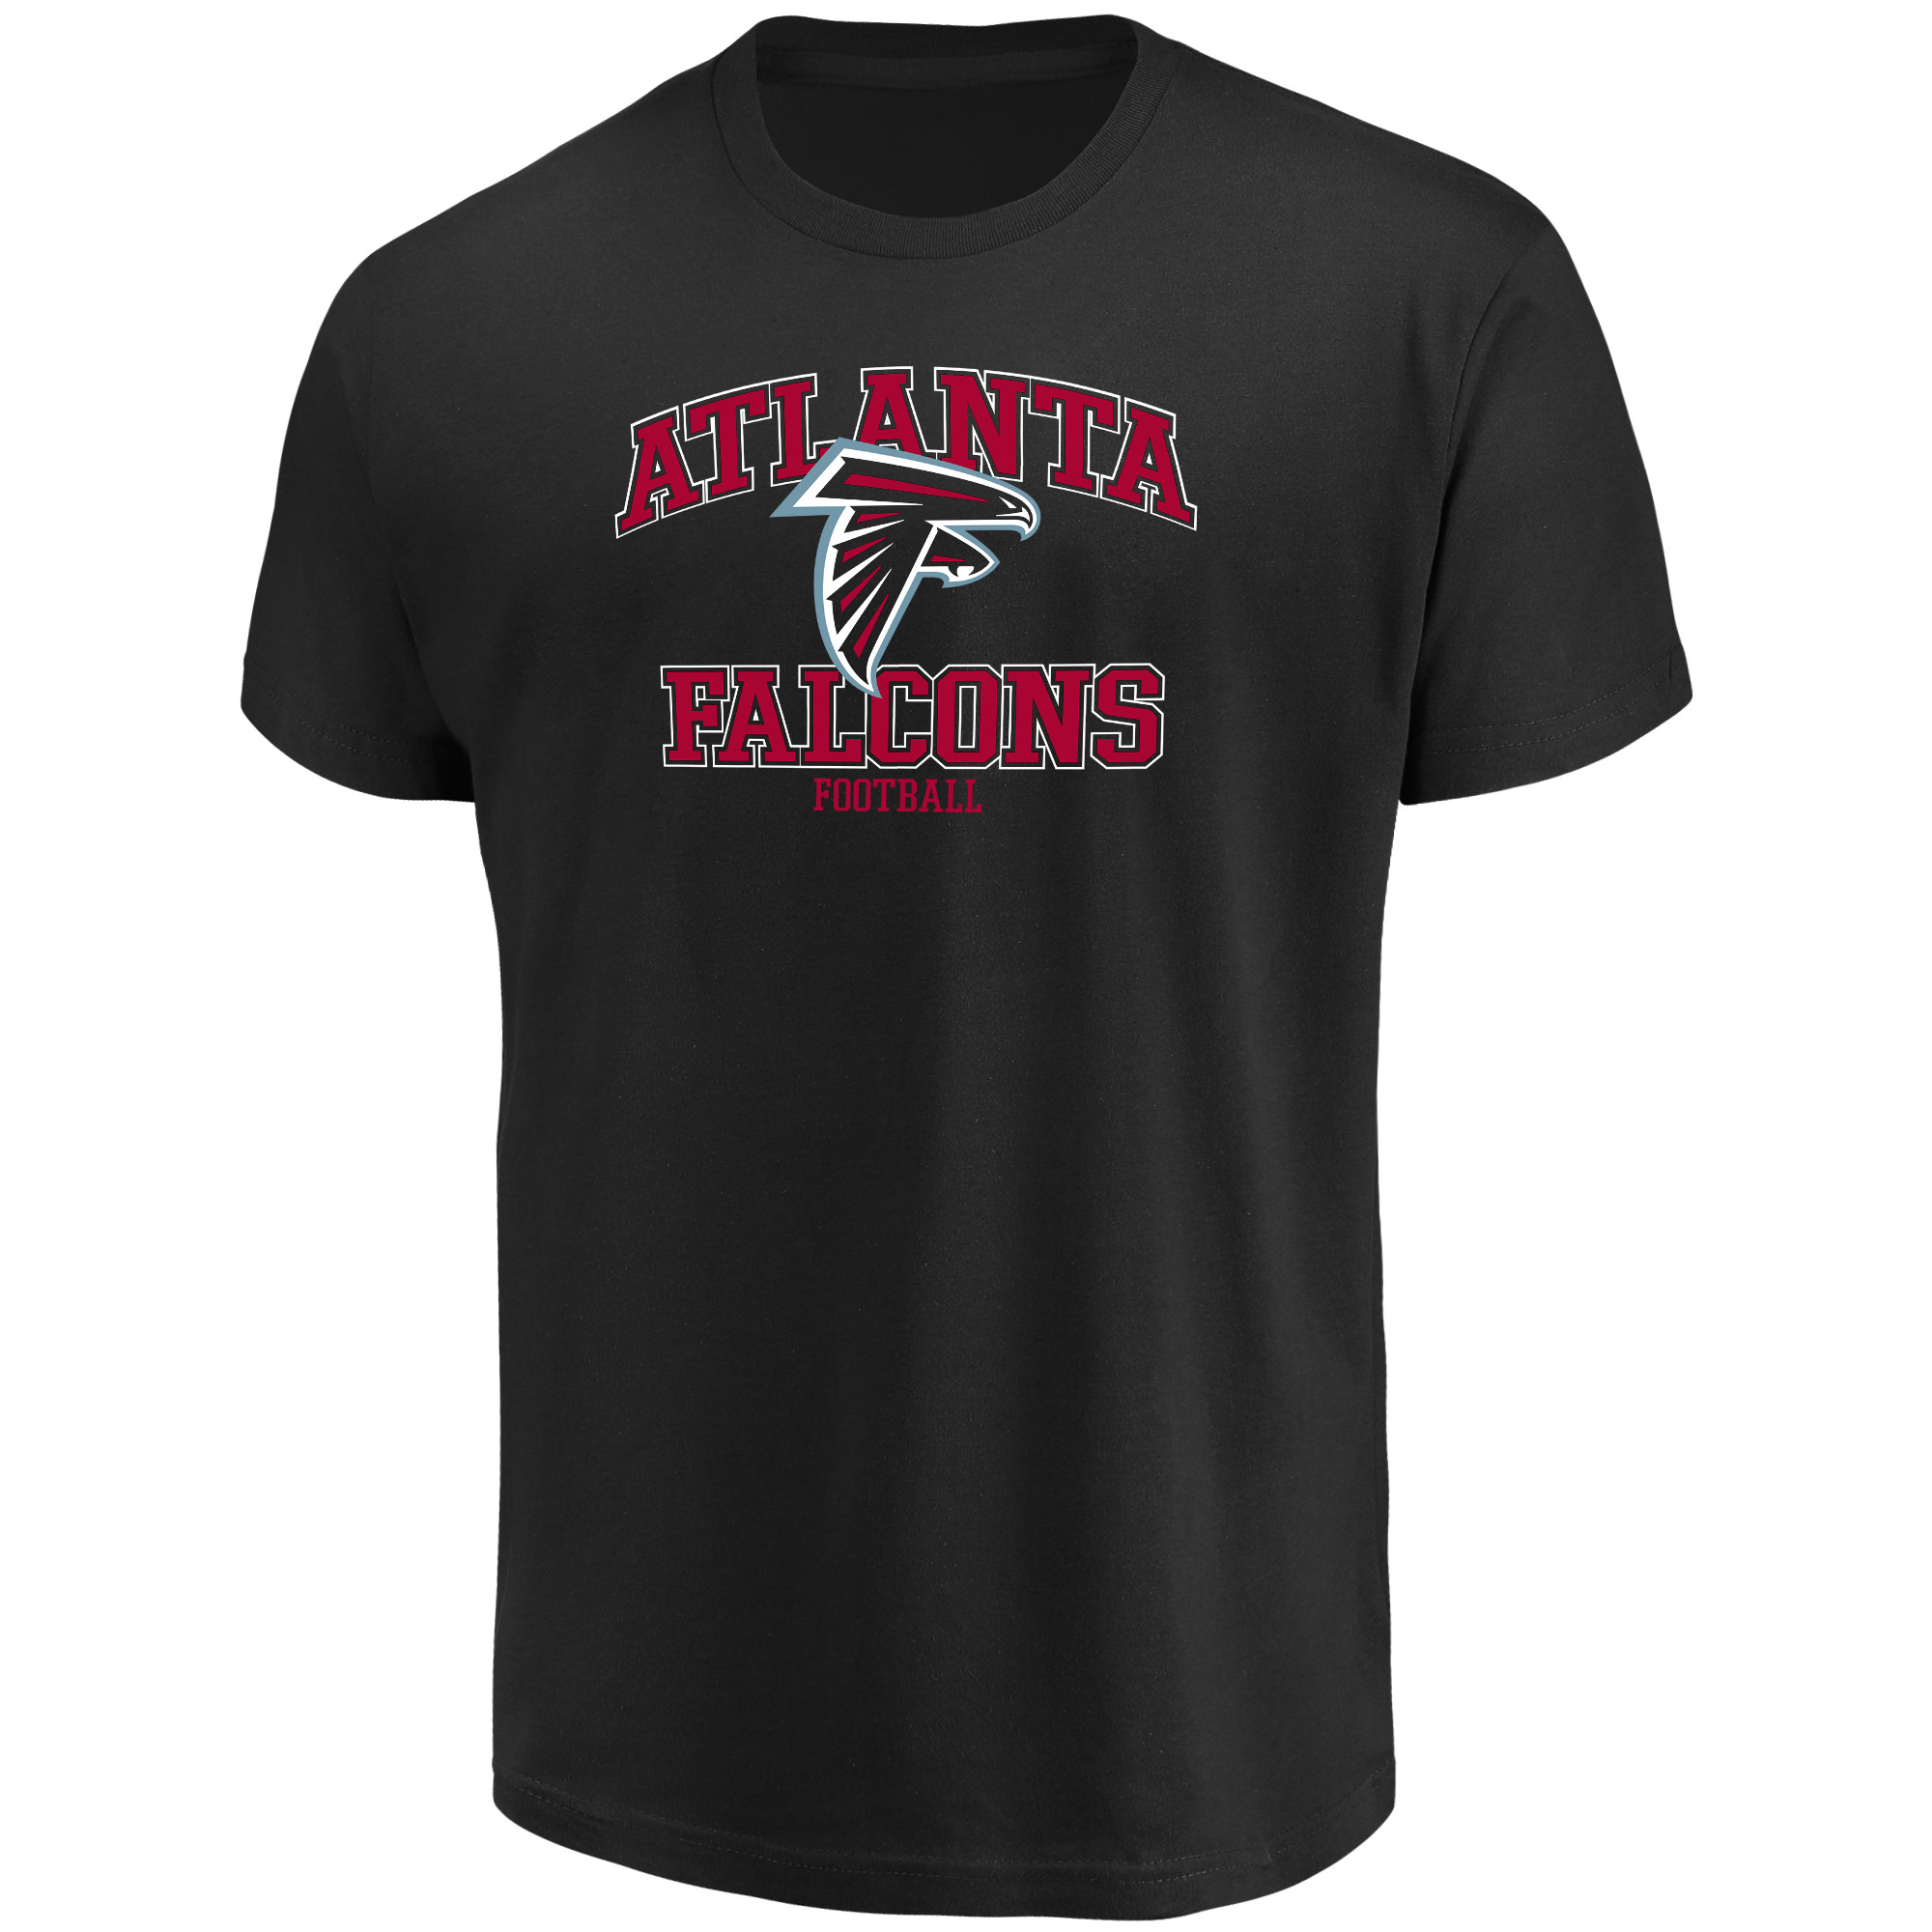 Men's Majestic Black Atlanta Falcons Greatness T-Shirt